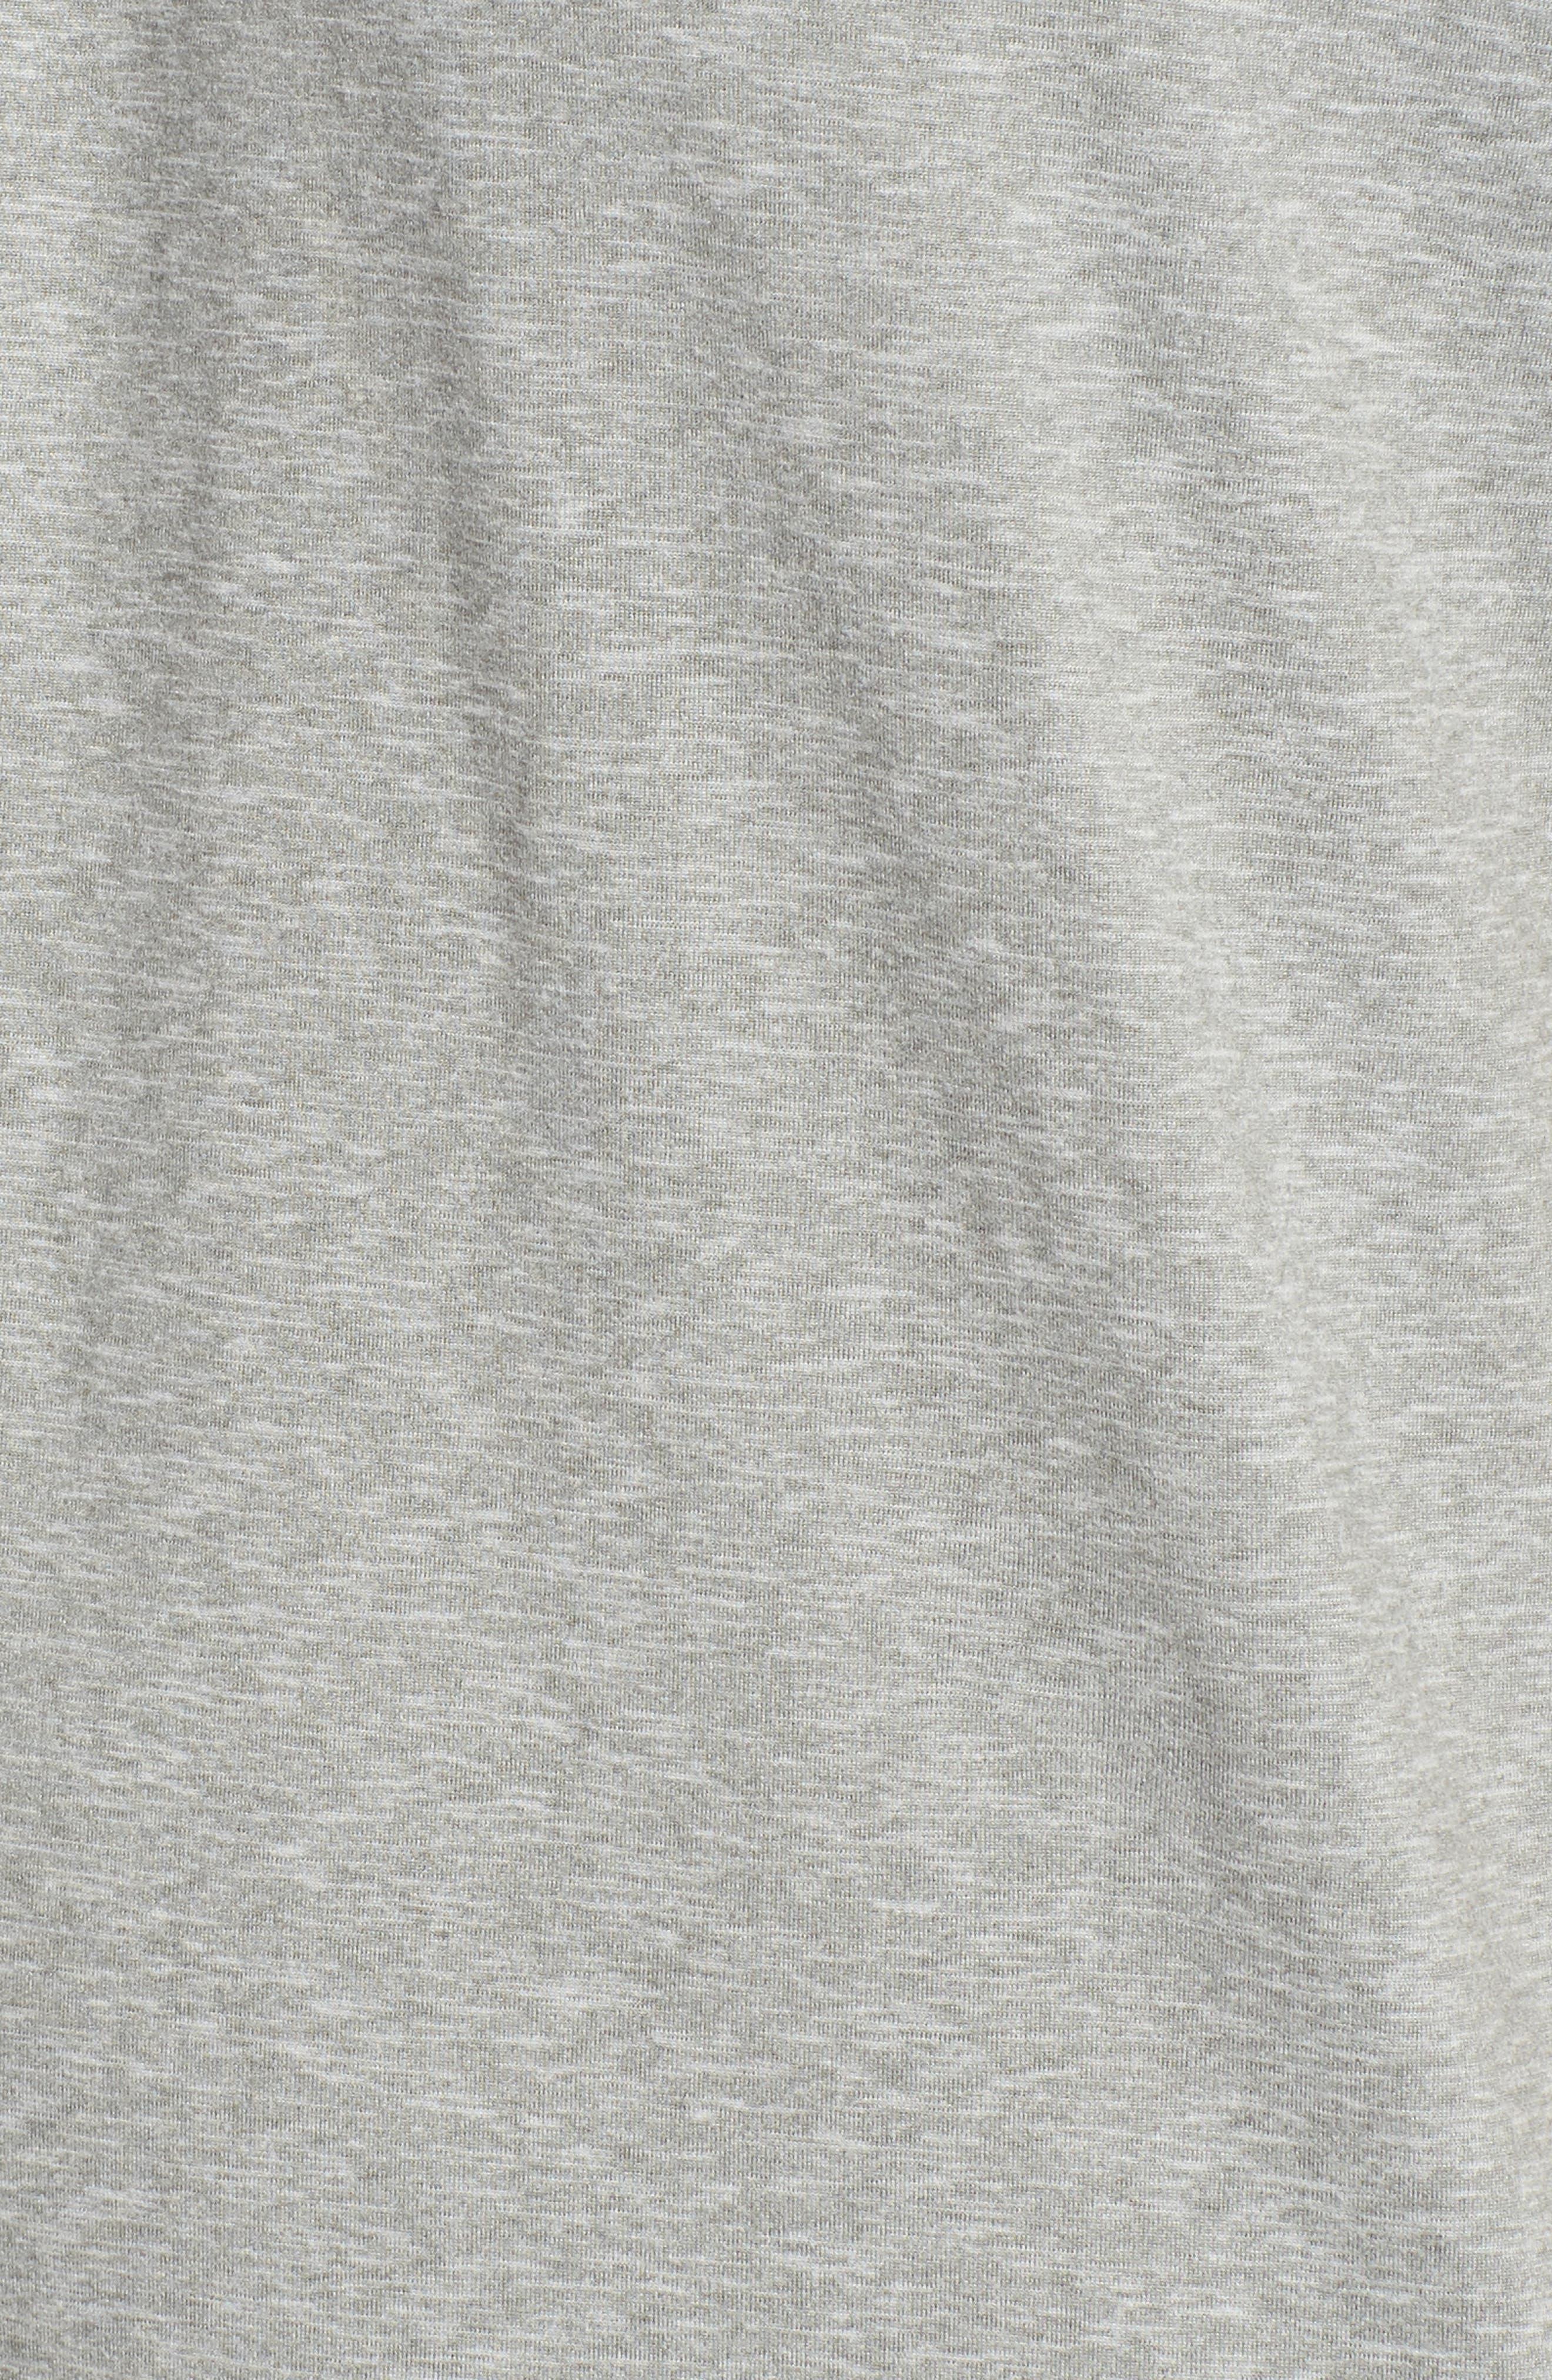 Therma Sleep Crewneck T-Shirt,                             Alternate thumbnail 5, color,                             Andover Heather/ Nevis